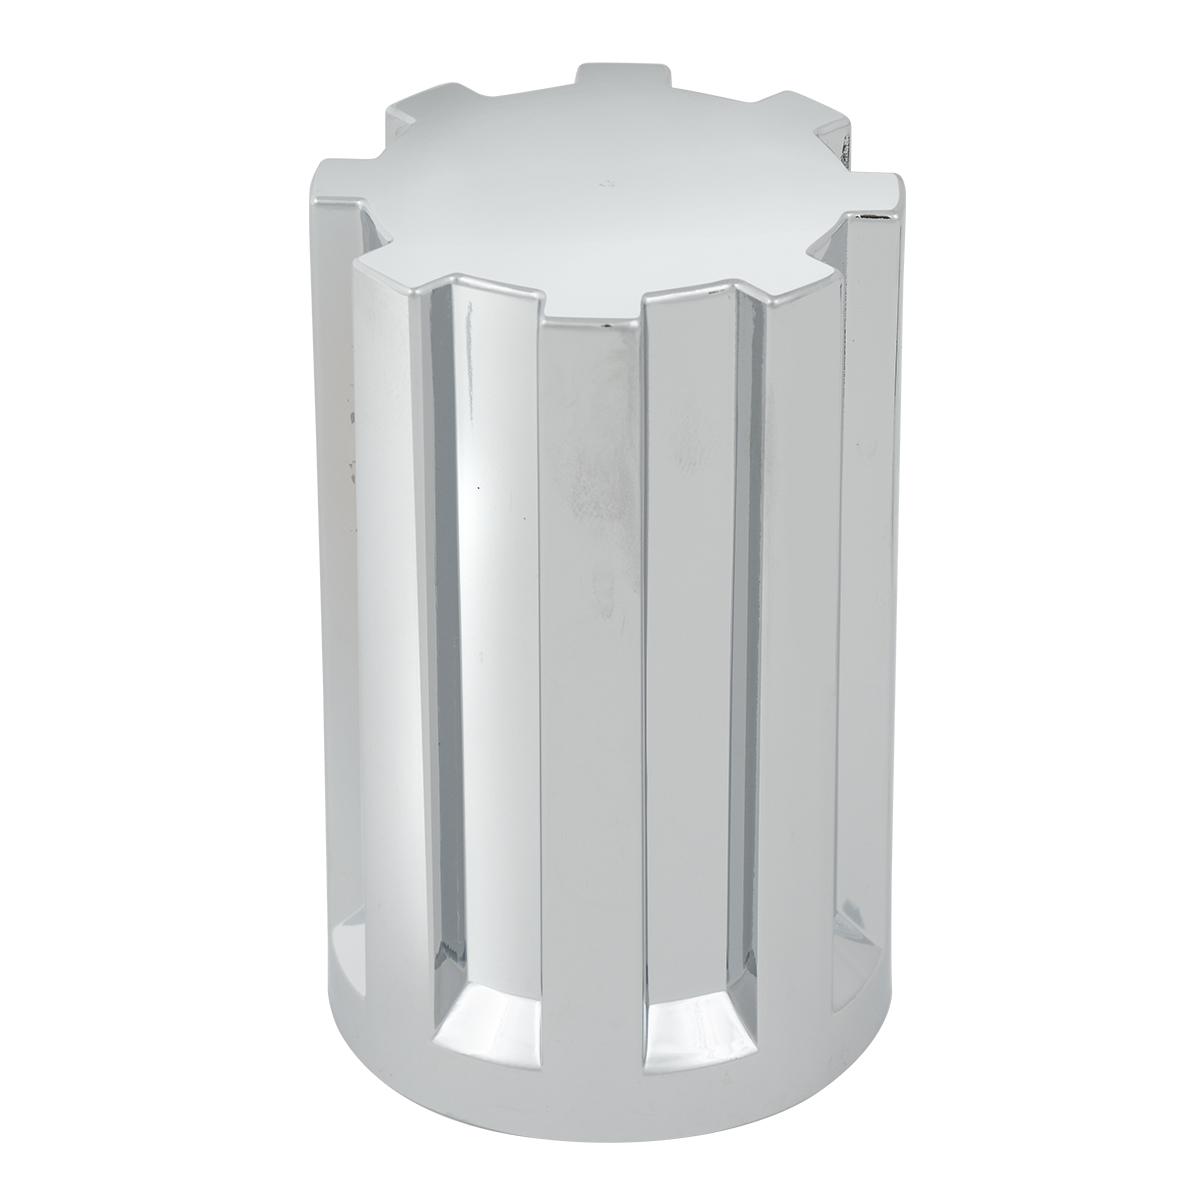 Gear Style Chrome Plastic 33mm Lug Nut Cover